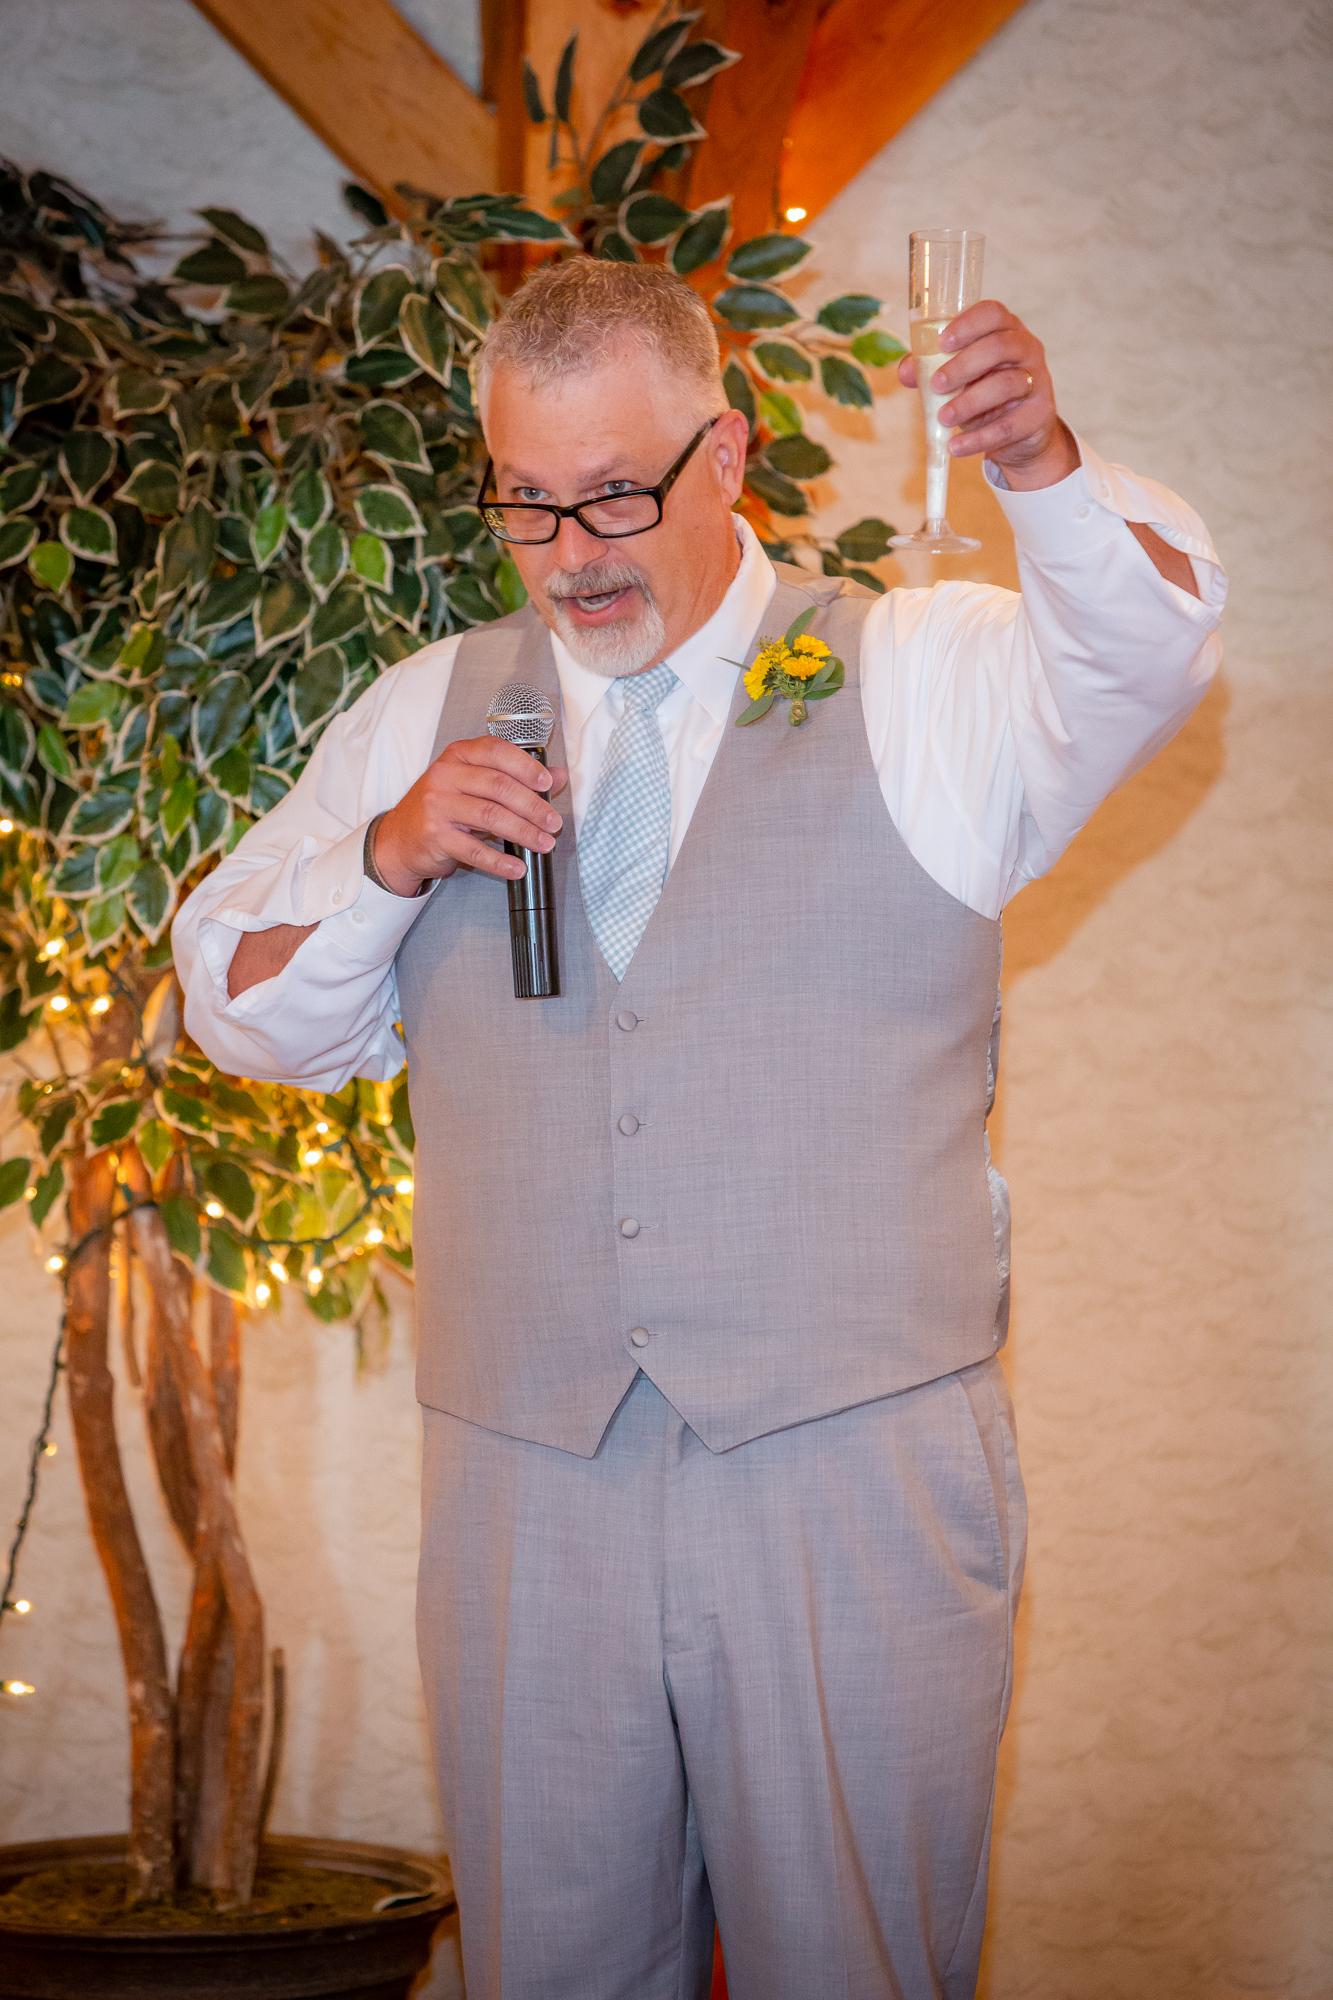 Wedding-Carriage-House-Oneonta-NY-0950.jpg